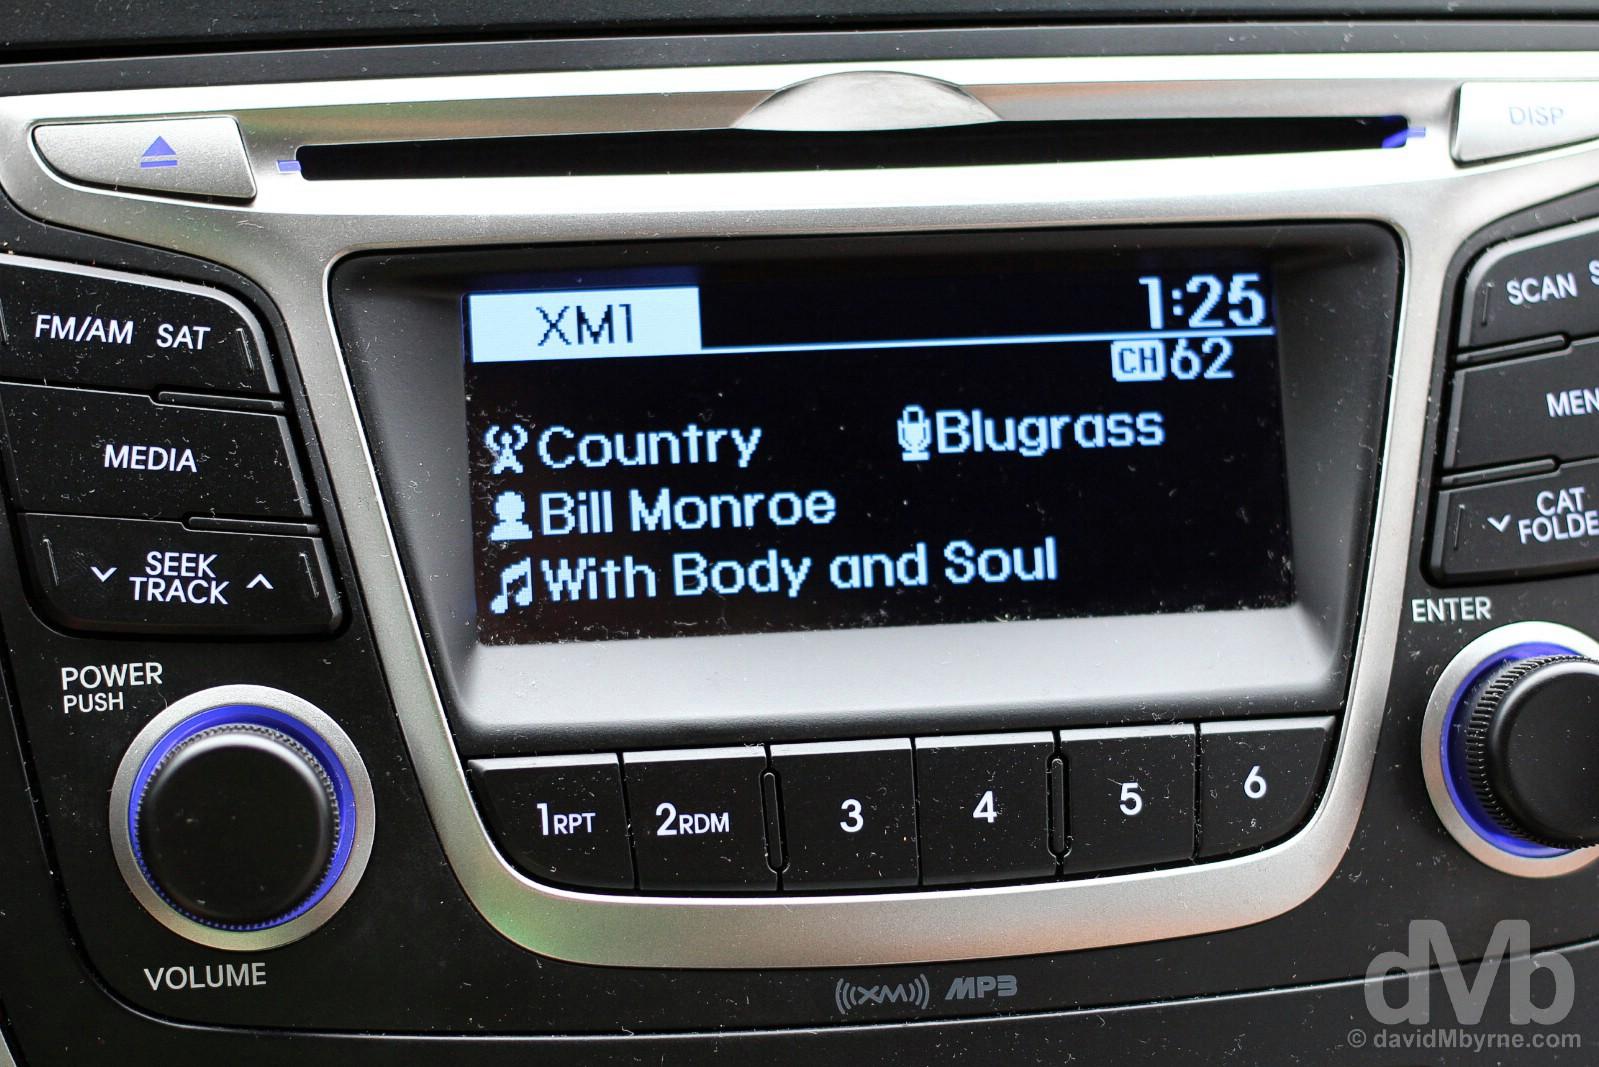 Bill Monroe on the radio in Rosine, Ohio County, Kentucky, USA. September 28, 2016.